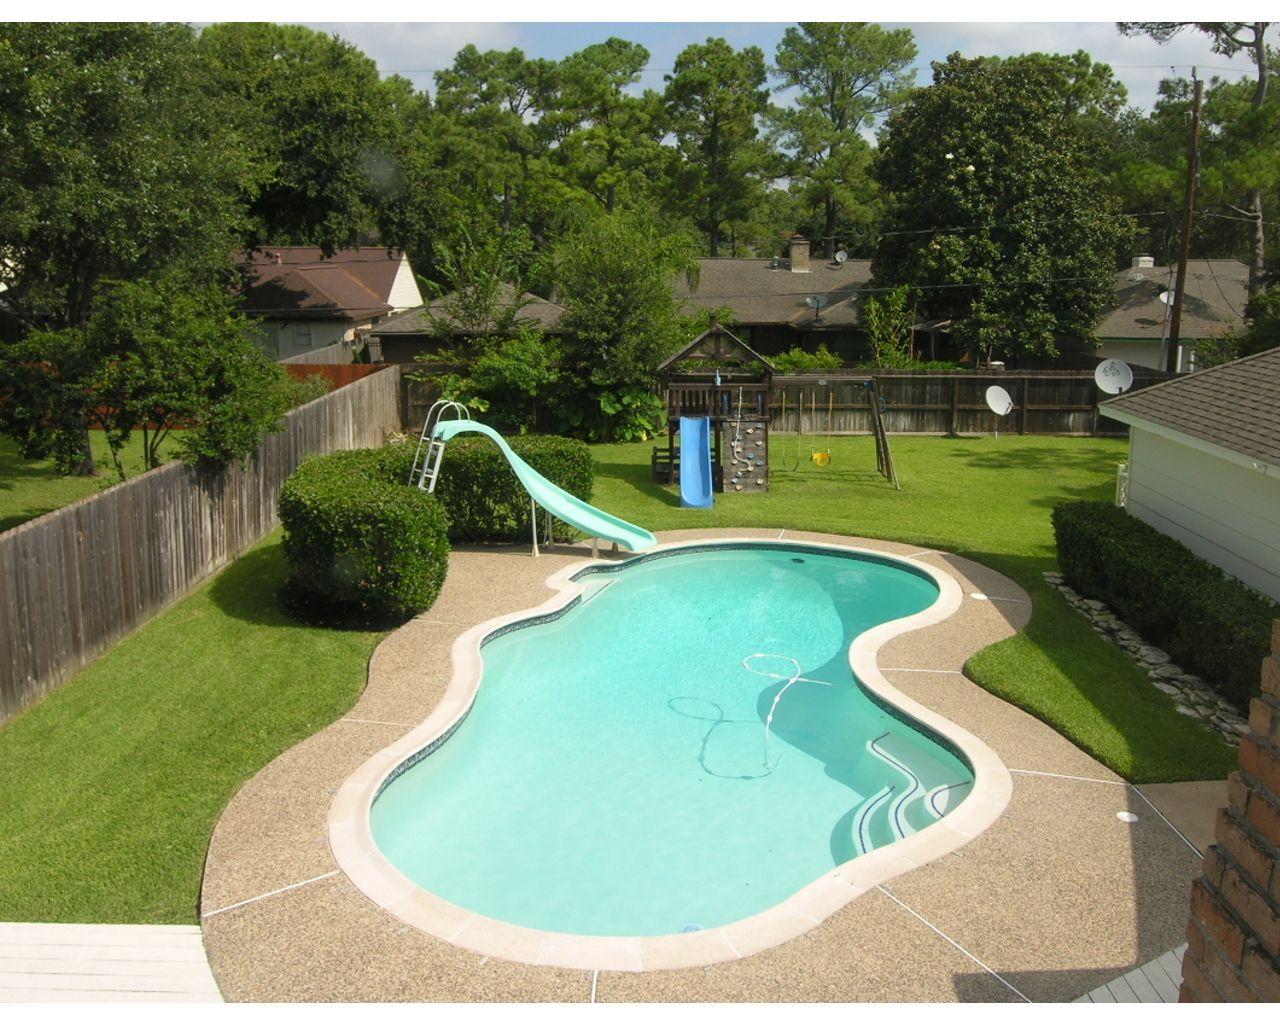 43 Texas Backyard Ideas With Pool https://silahsilah.com ...